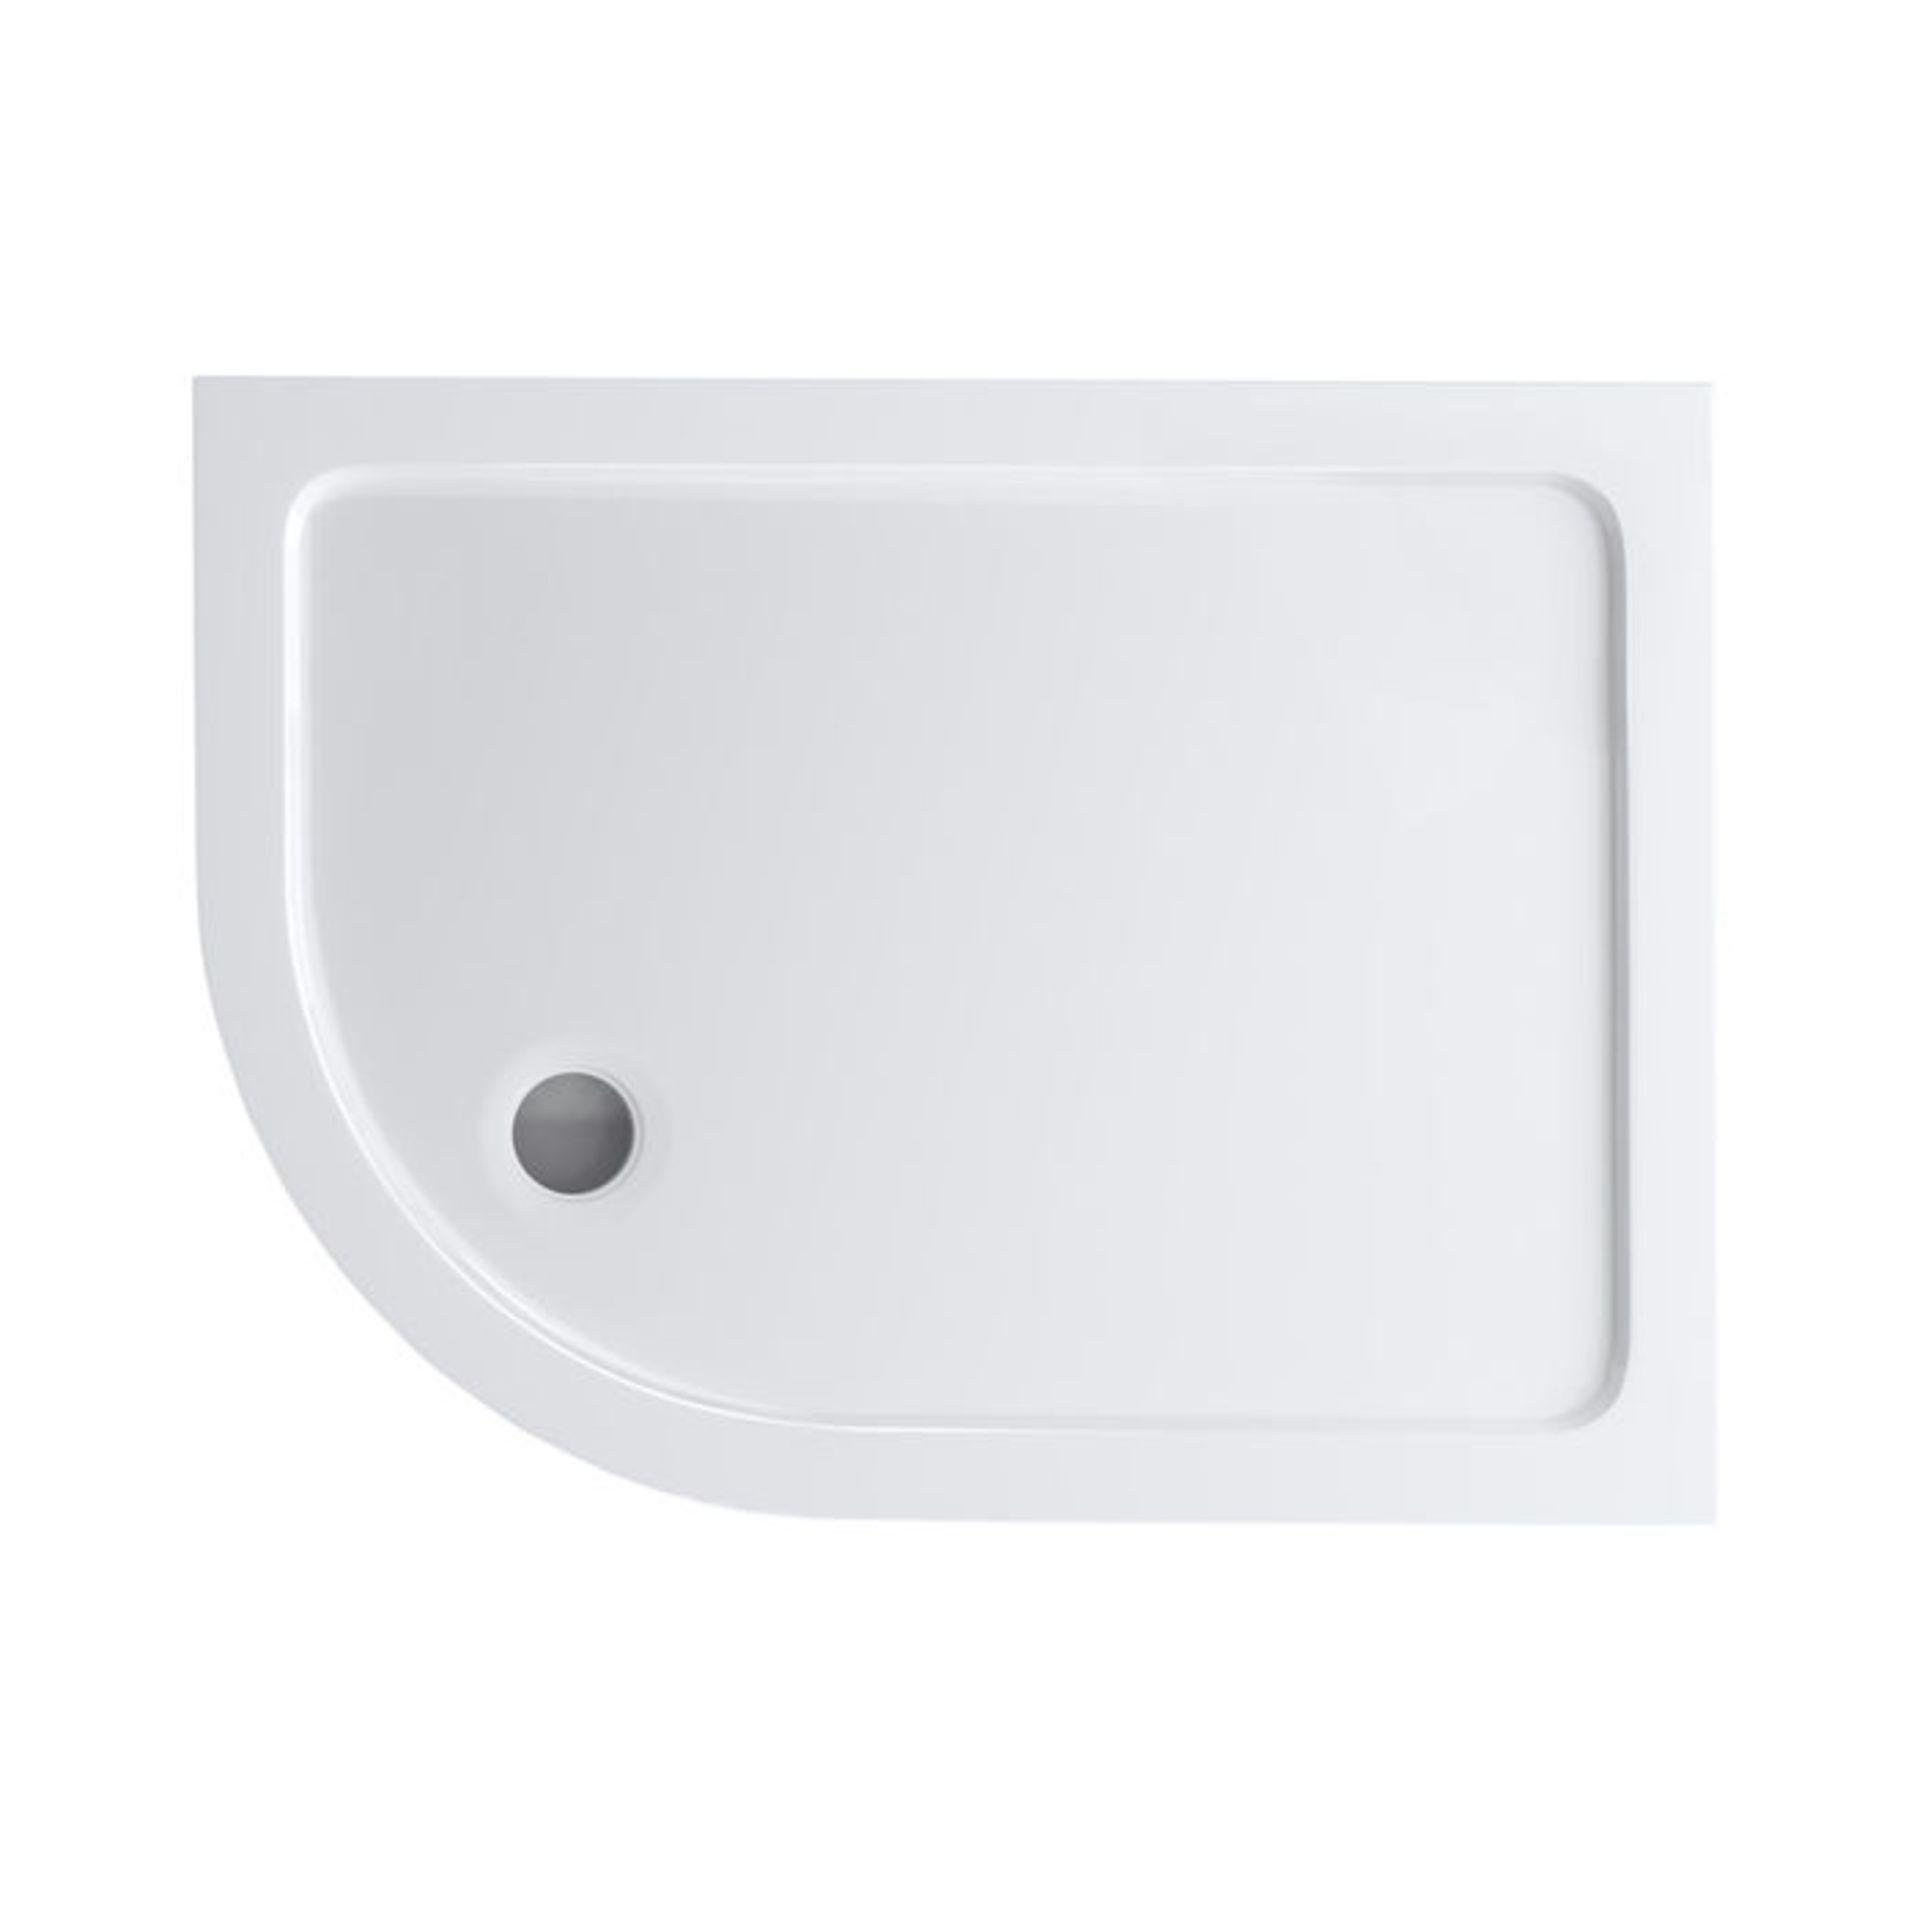 Lot 7 - (W119) 1200x900mm Offset Quadrant Ultra Slim Stone Shower Tray - Left. Low profile ultra slim design